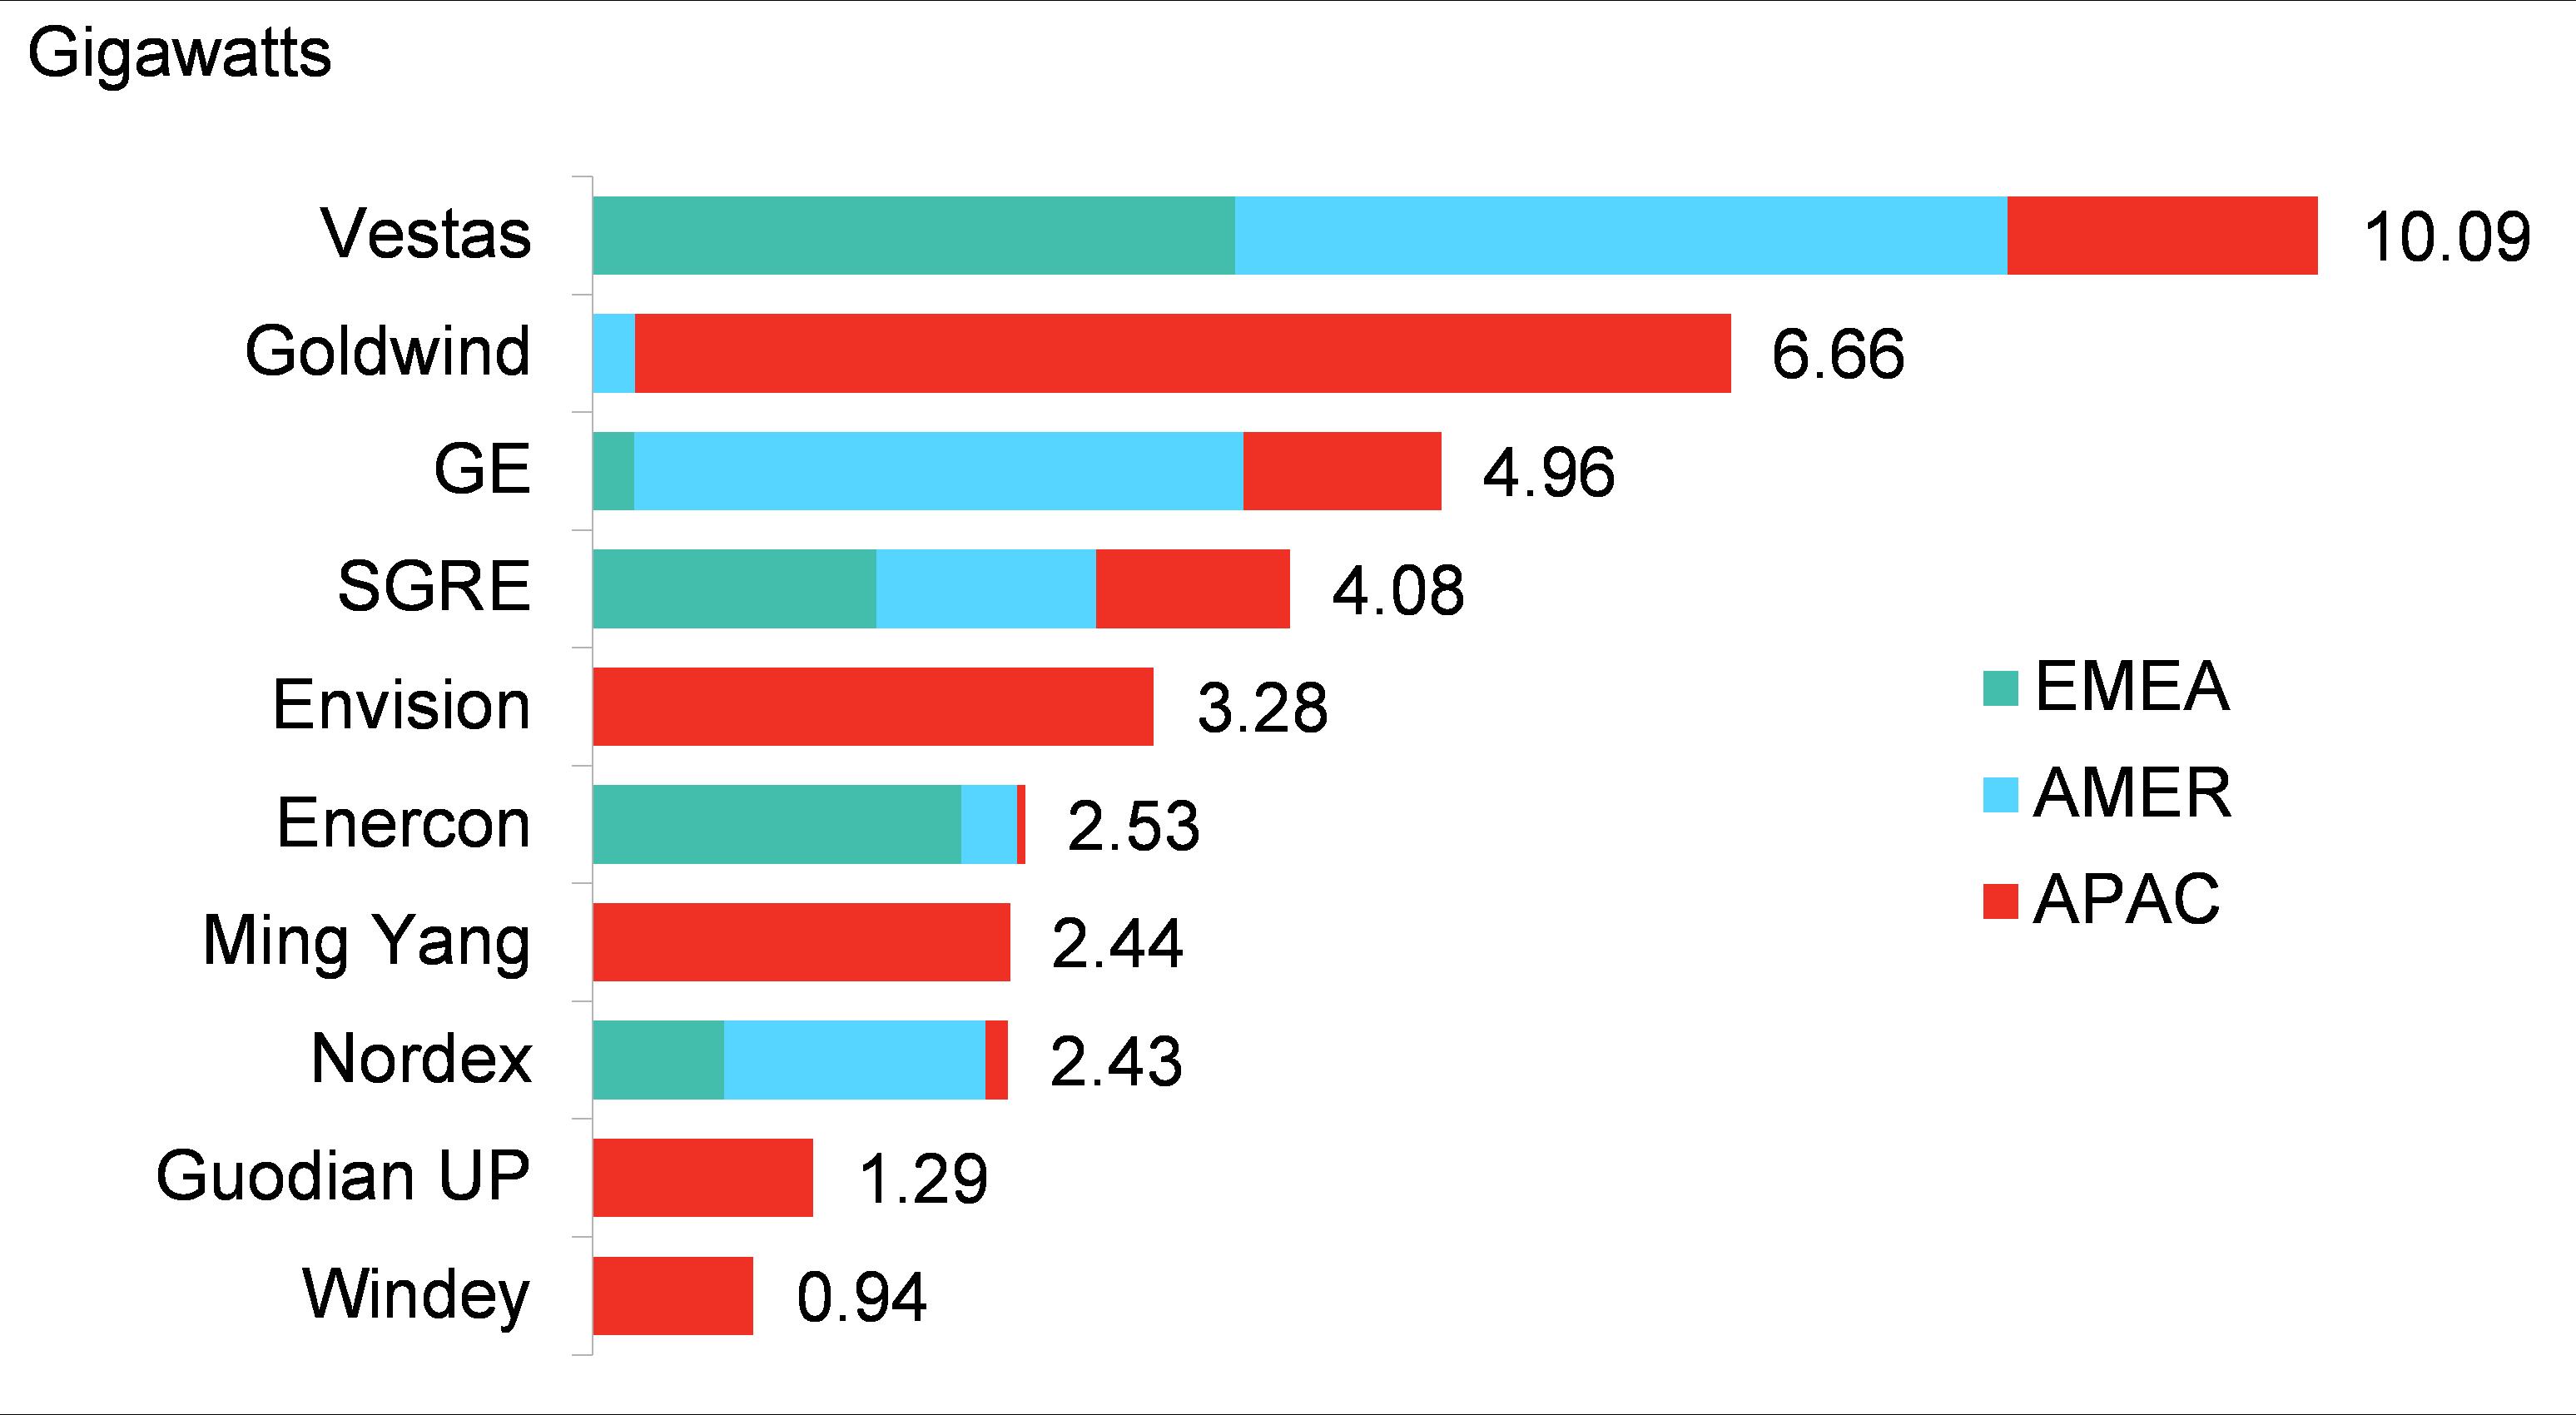 BNEF - Figure 1 - Top 10 global onshore wind turbine makers.png